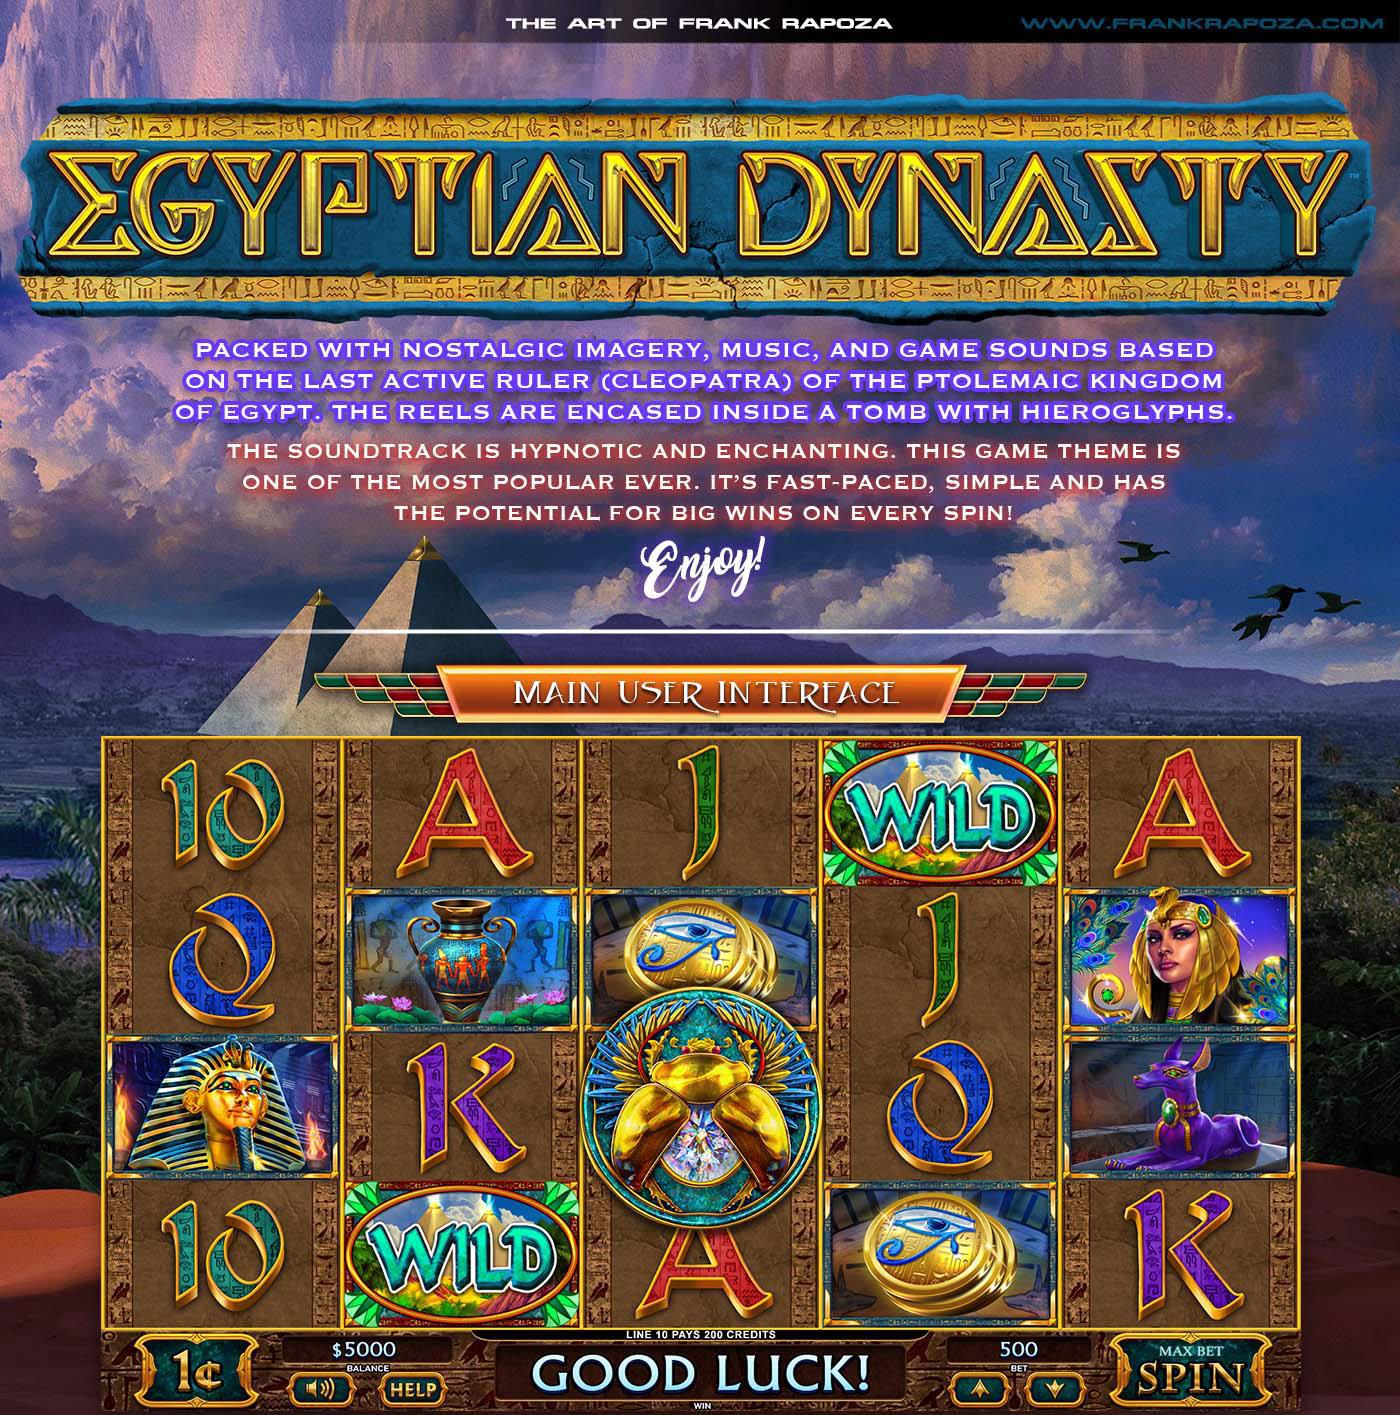 art casino Character cleopatra design egypt Gaming gold ILLUSTRATION  logo